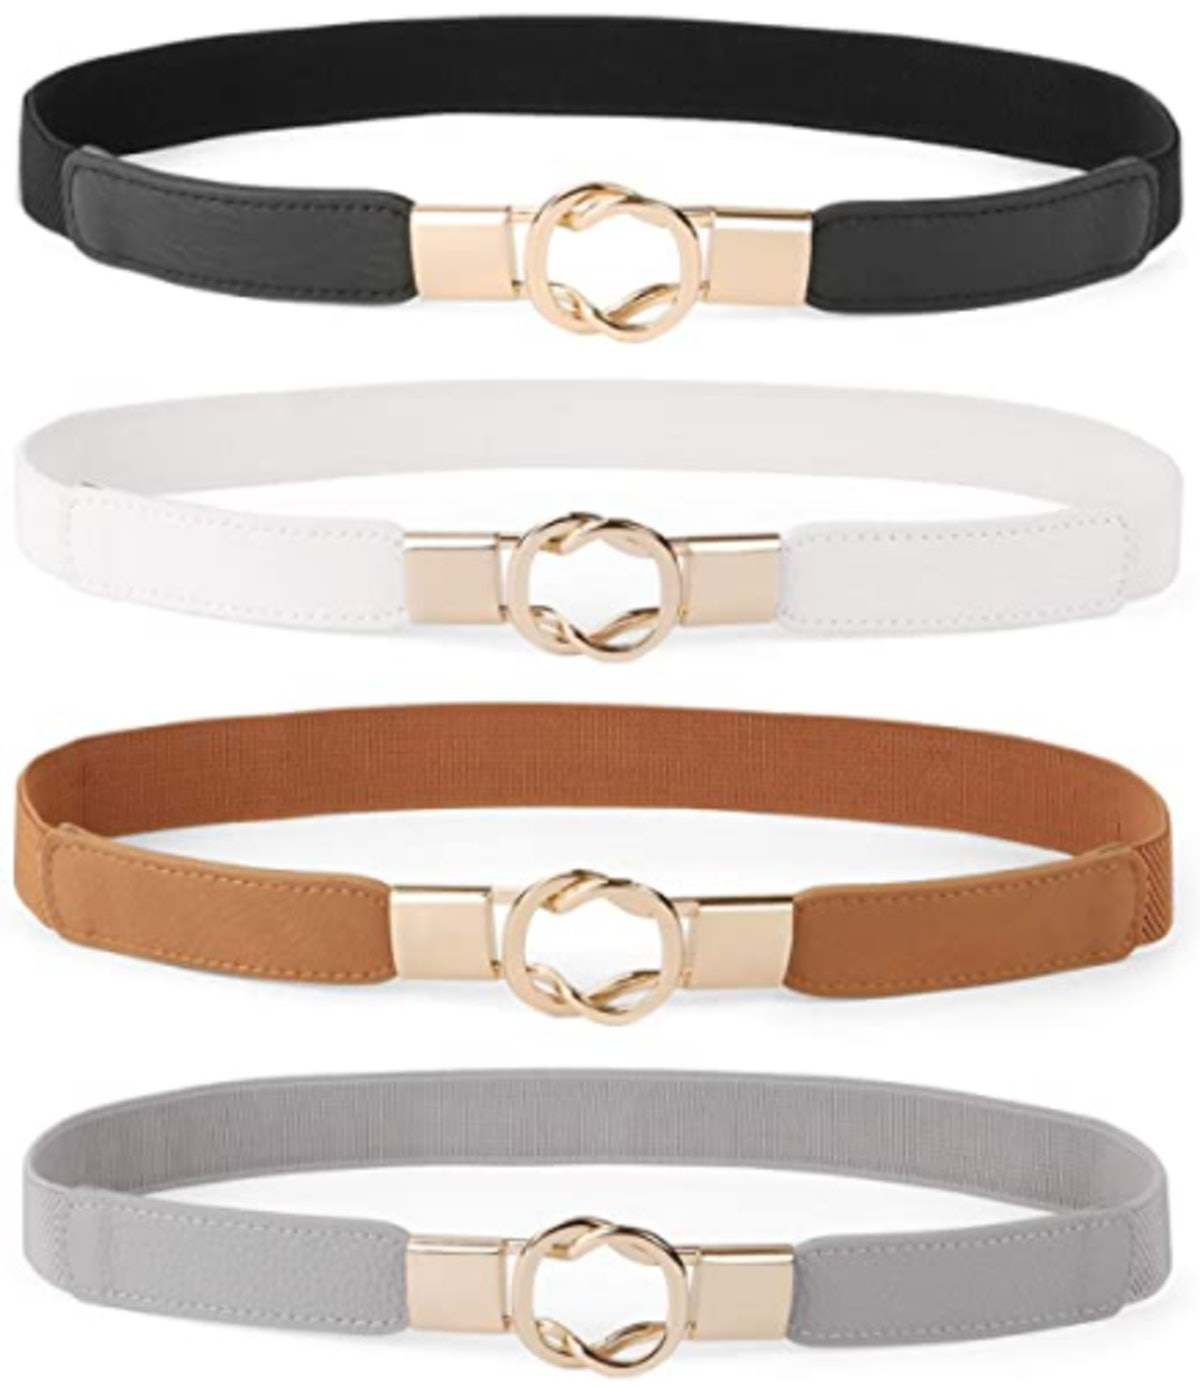 WERFORU Skinny Belts (Set of 4)